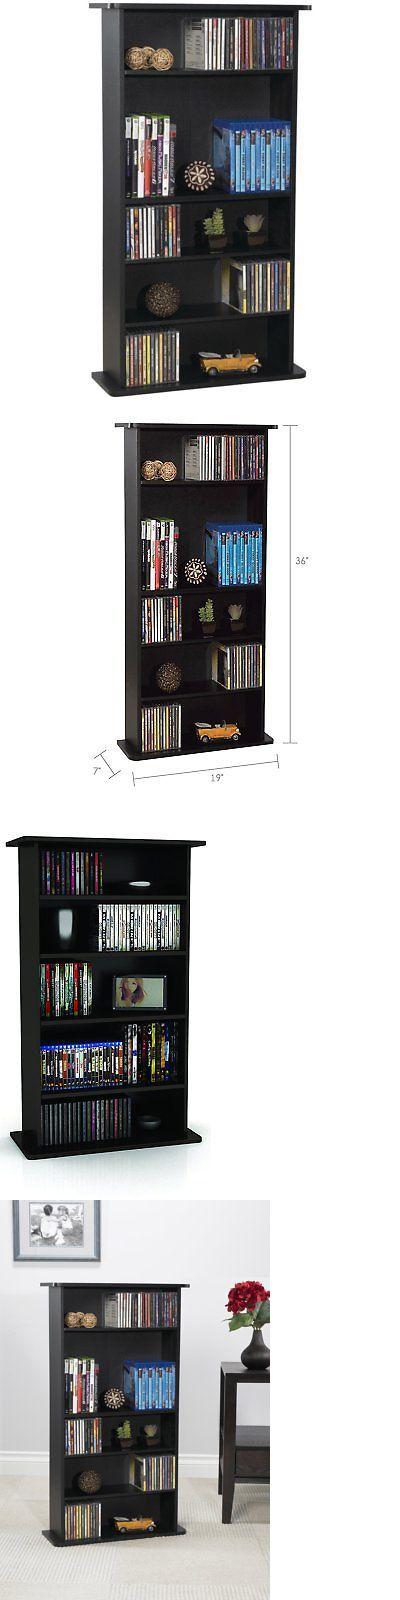 CD and Video Racks 22653: Multimedia Storage Rack Media Cabinet Blu-Ray Cd Dvd Games Tower Shelf Organizer -> BUY IT NOW ONLY: $36.34 on eBay!